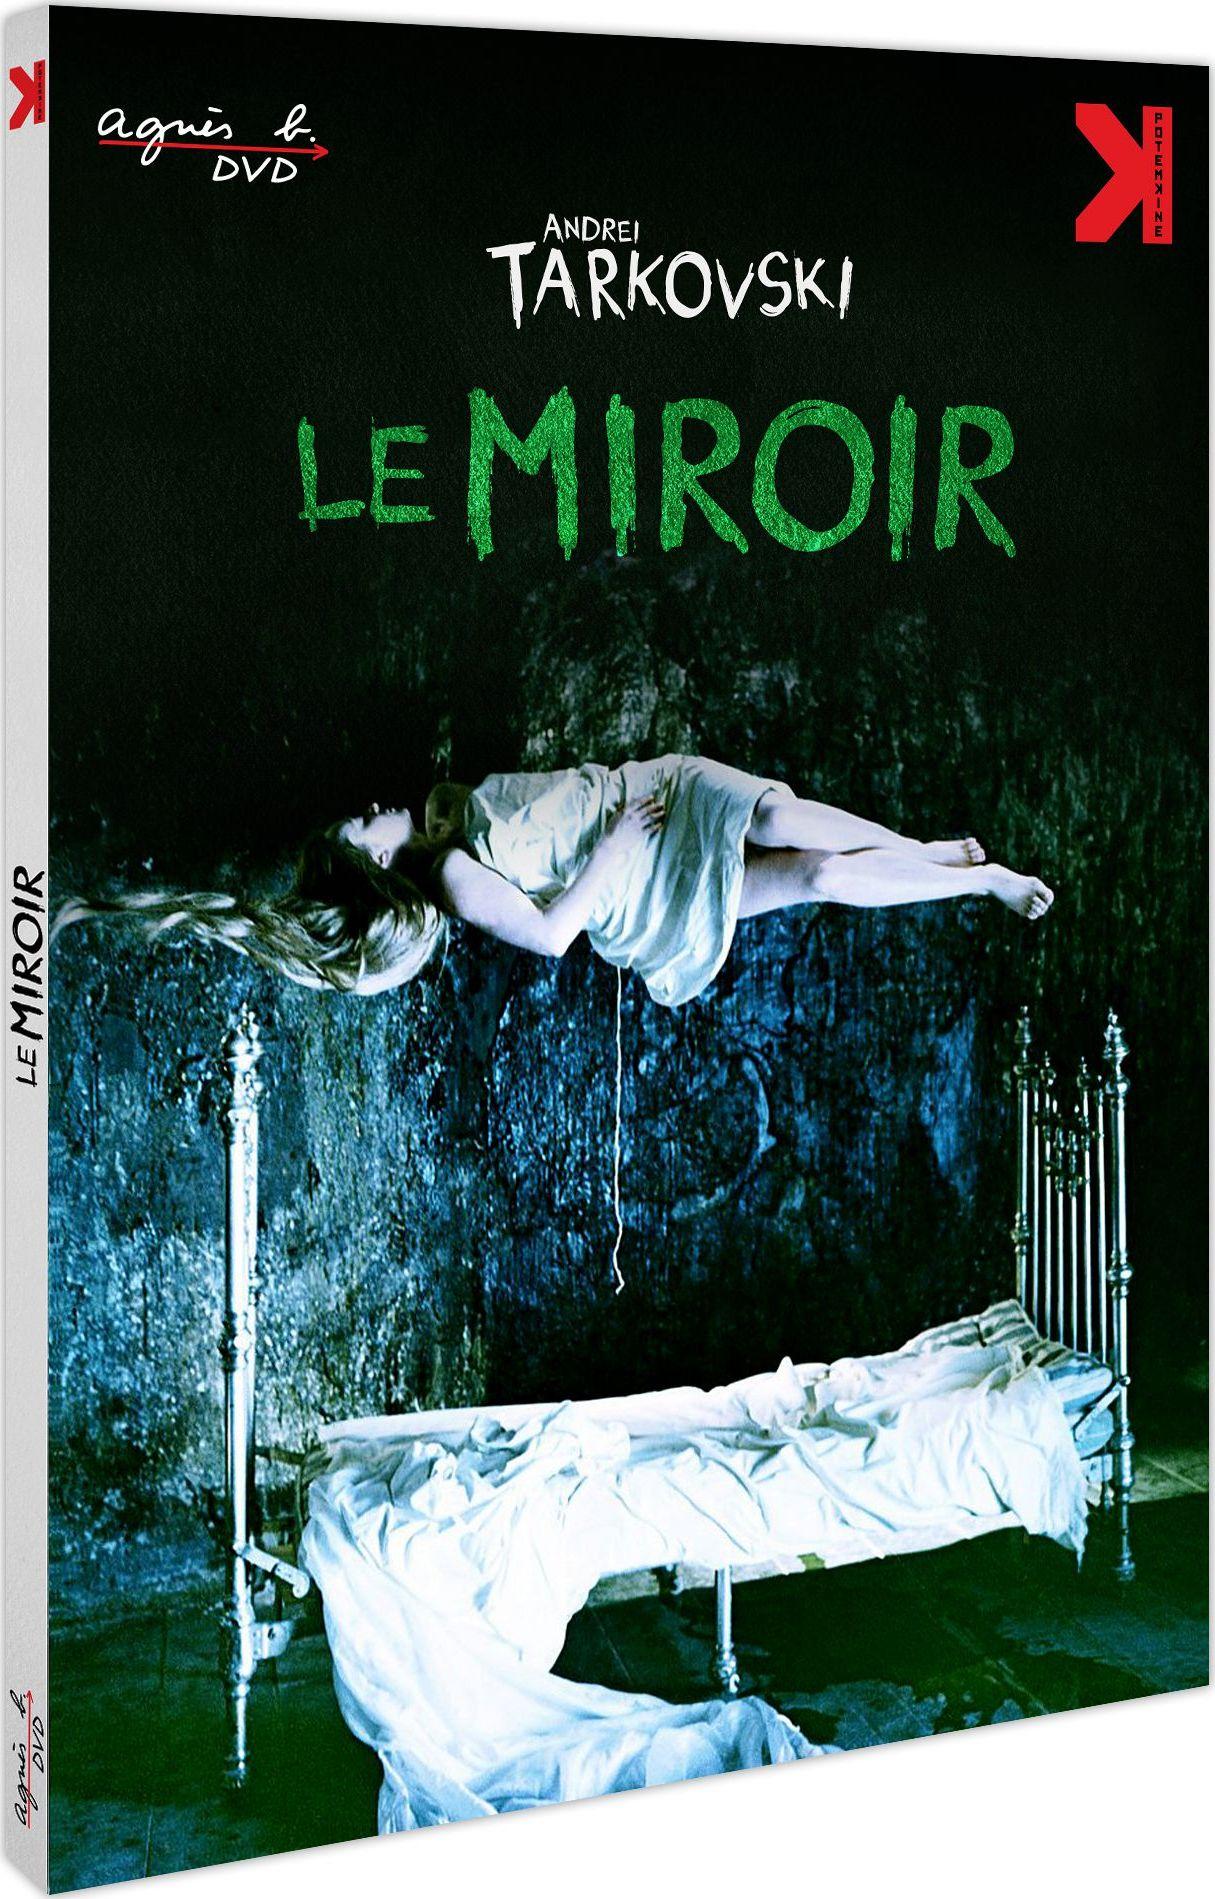 Le miroir test dvd potemkine dvdclassik for Le miroir tarkovski